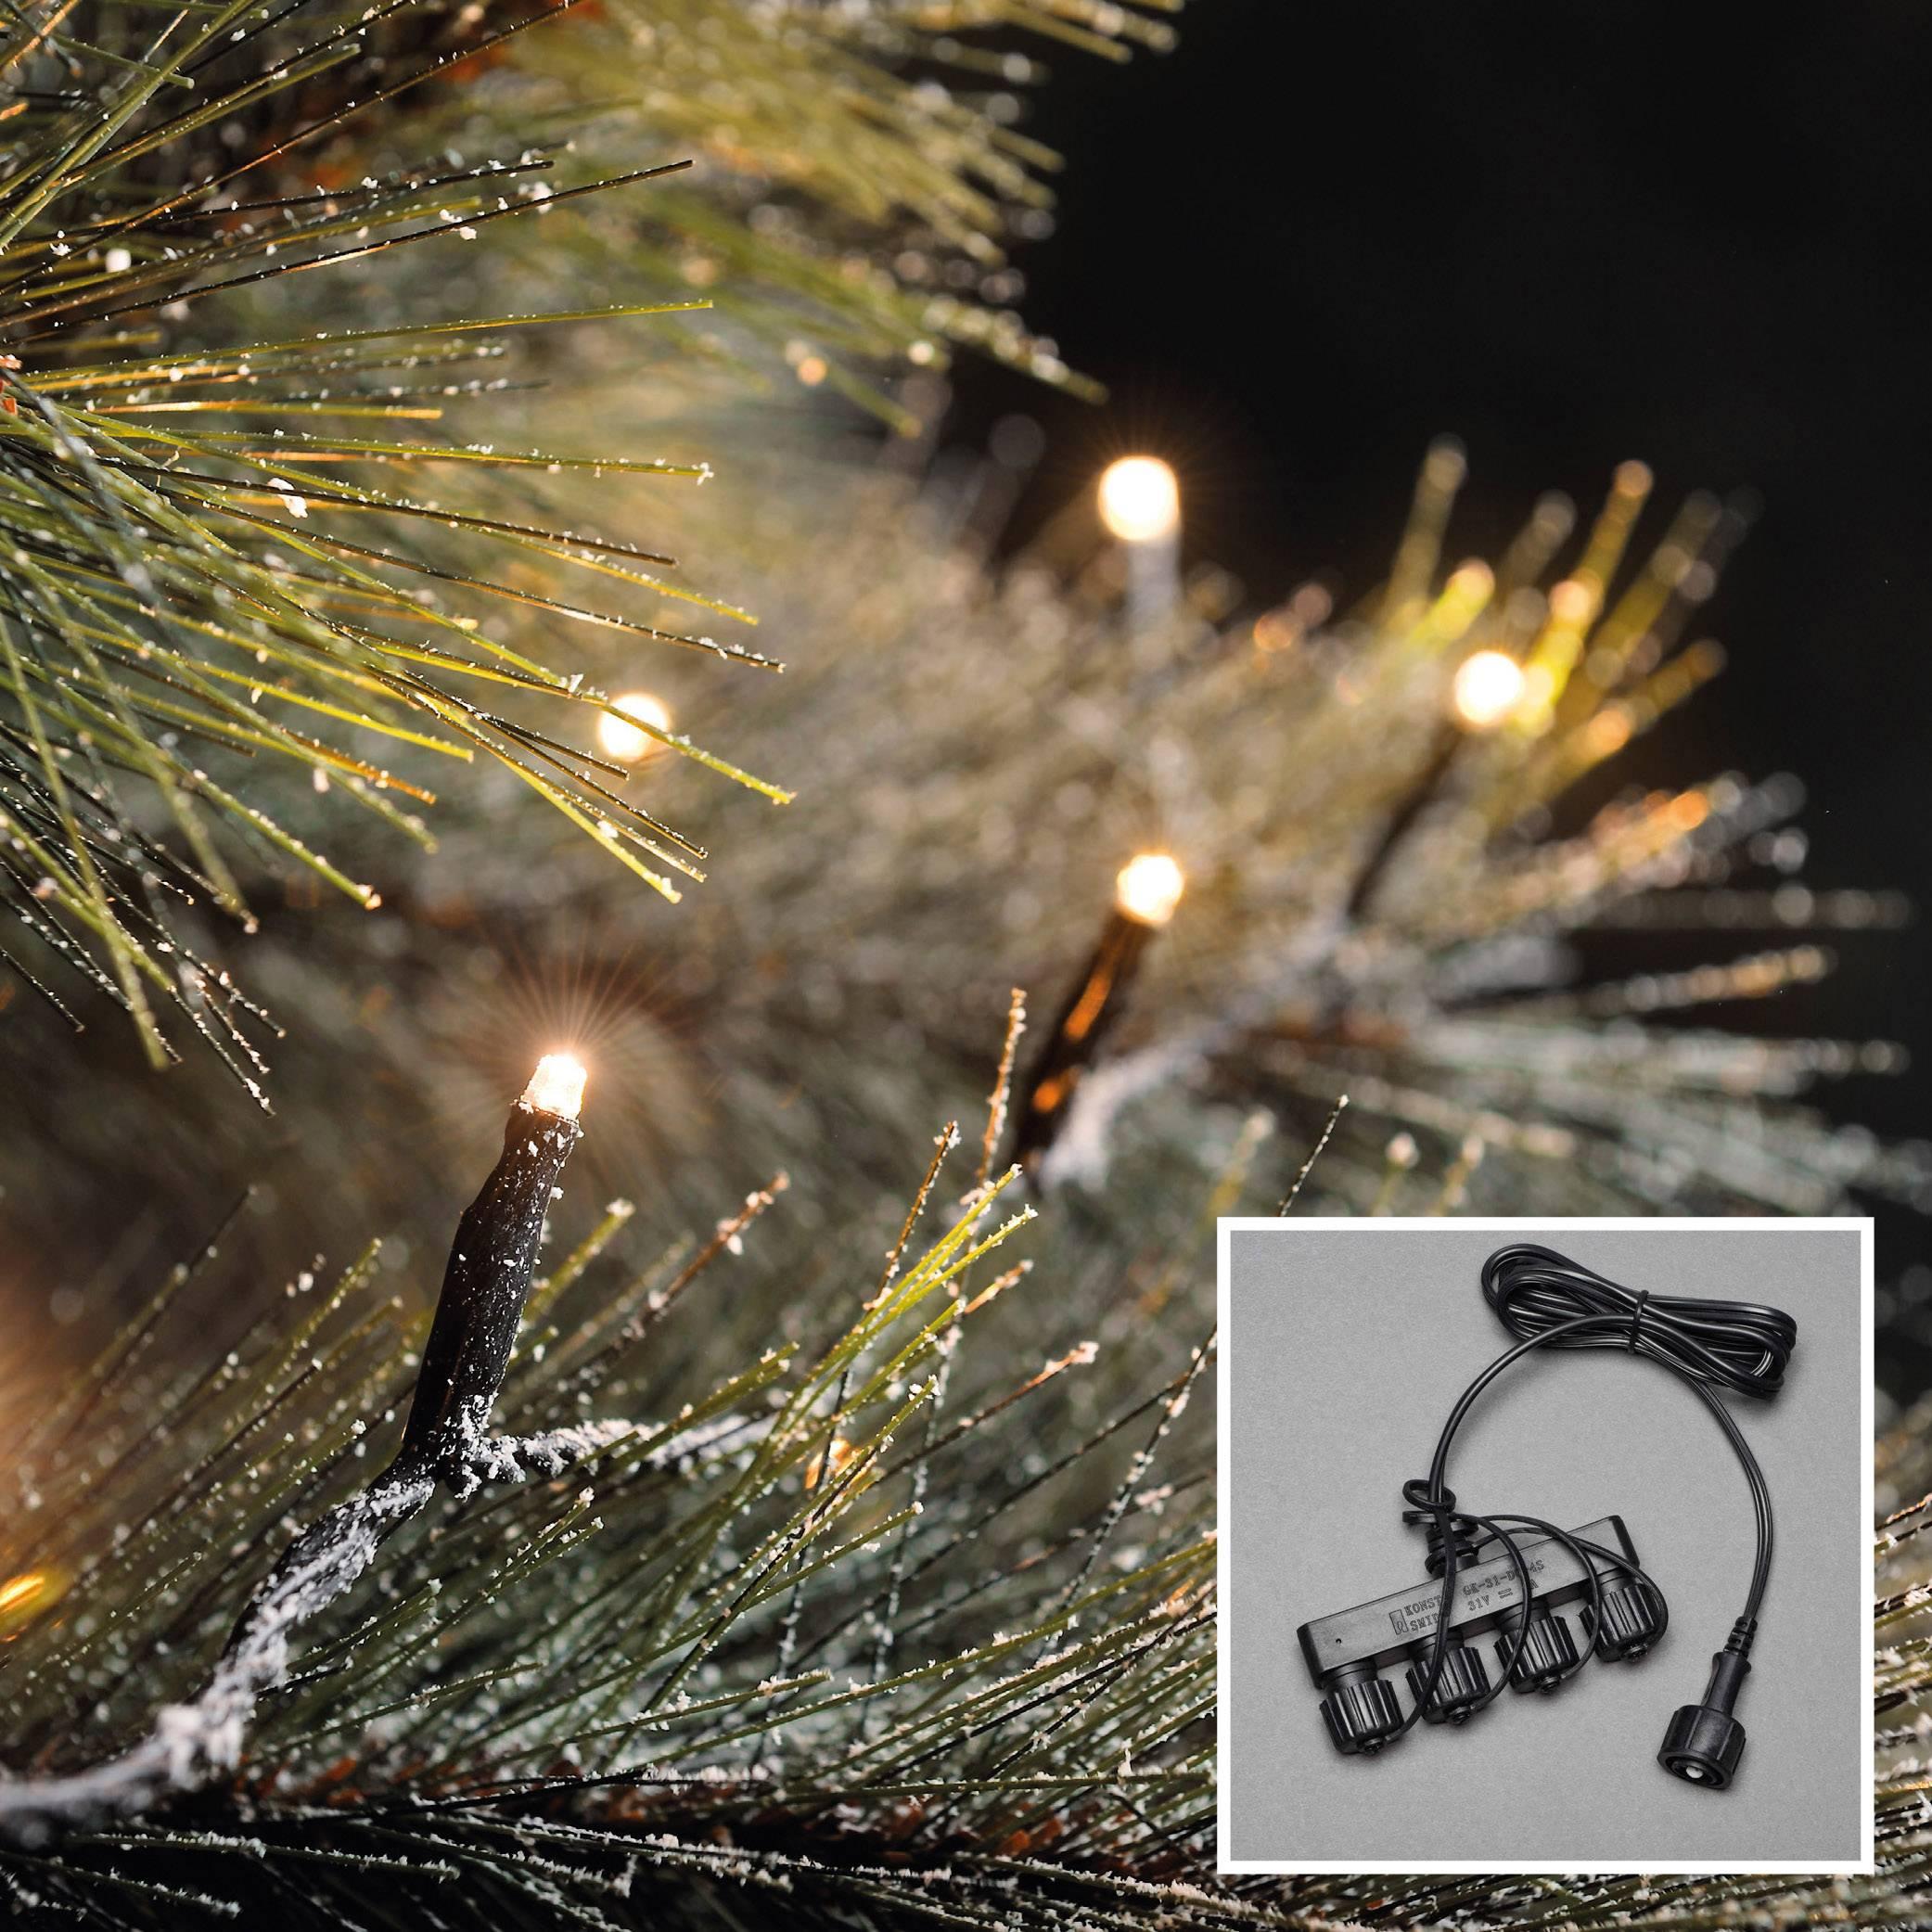 izdelek-konstsmide-led-osnovni-sistem-svetlobne-verige-31-v-svetlobn